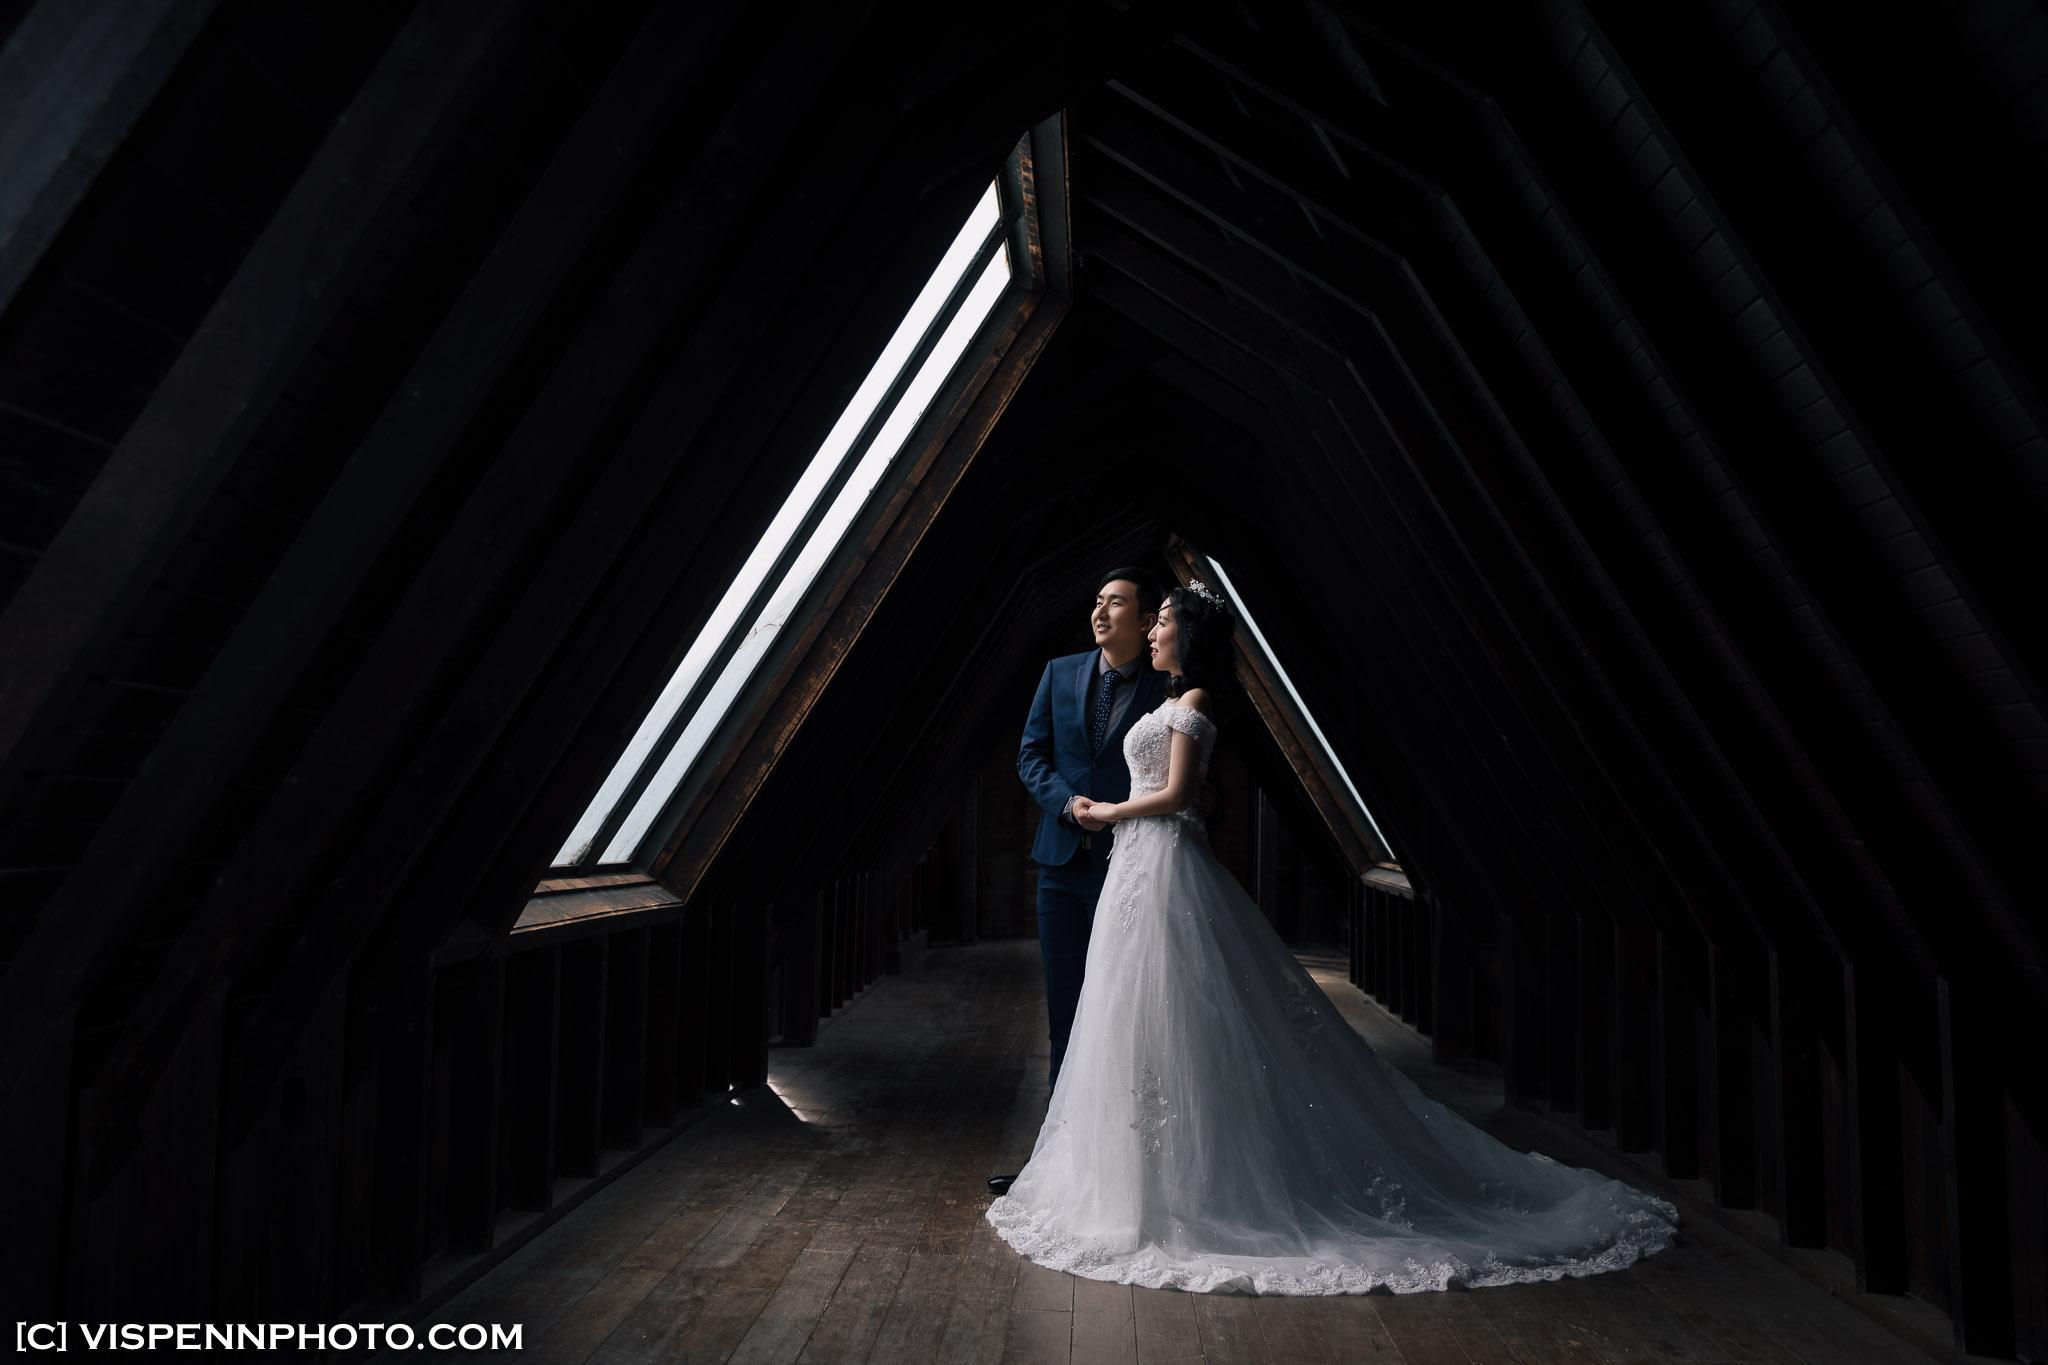 PRE WEDDING Photography Melbourne VISPENN 墨尔本 婚纱照 结婚照 婚纱摄影 VISPENN 5D4 0337